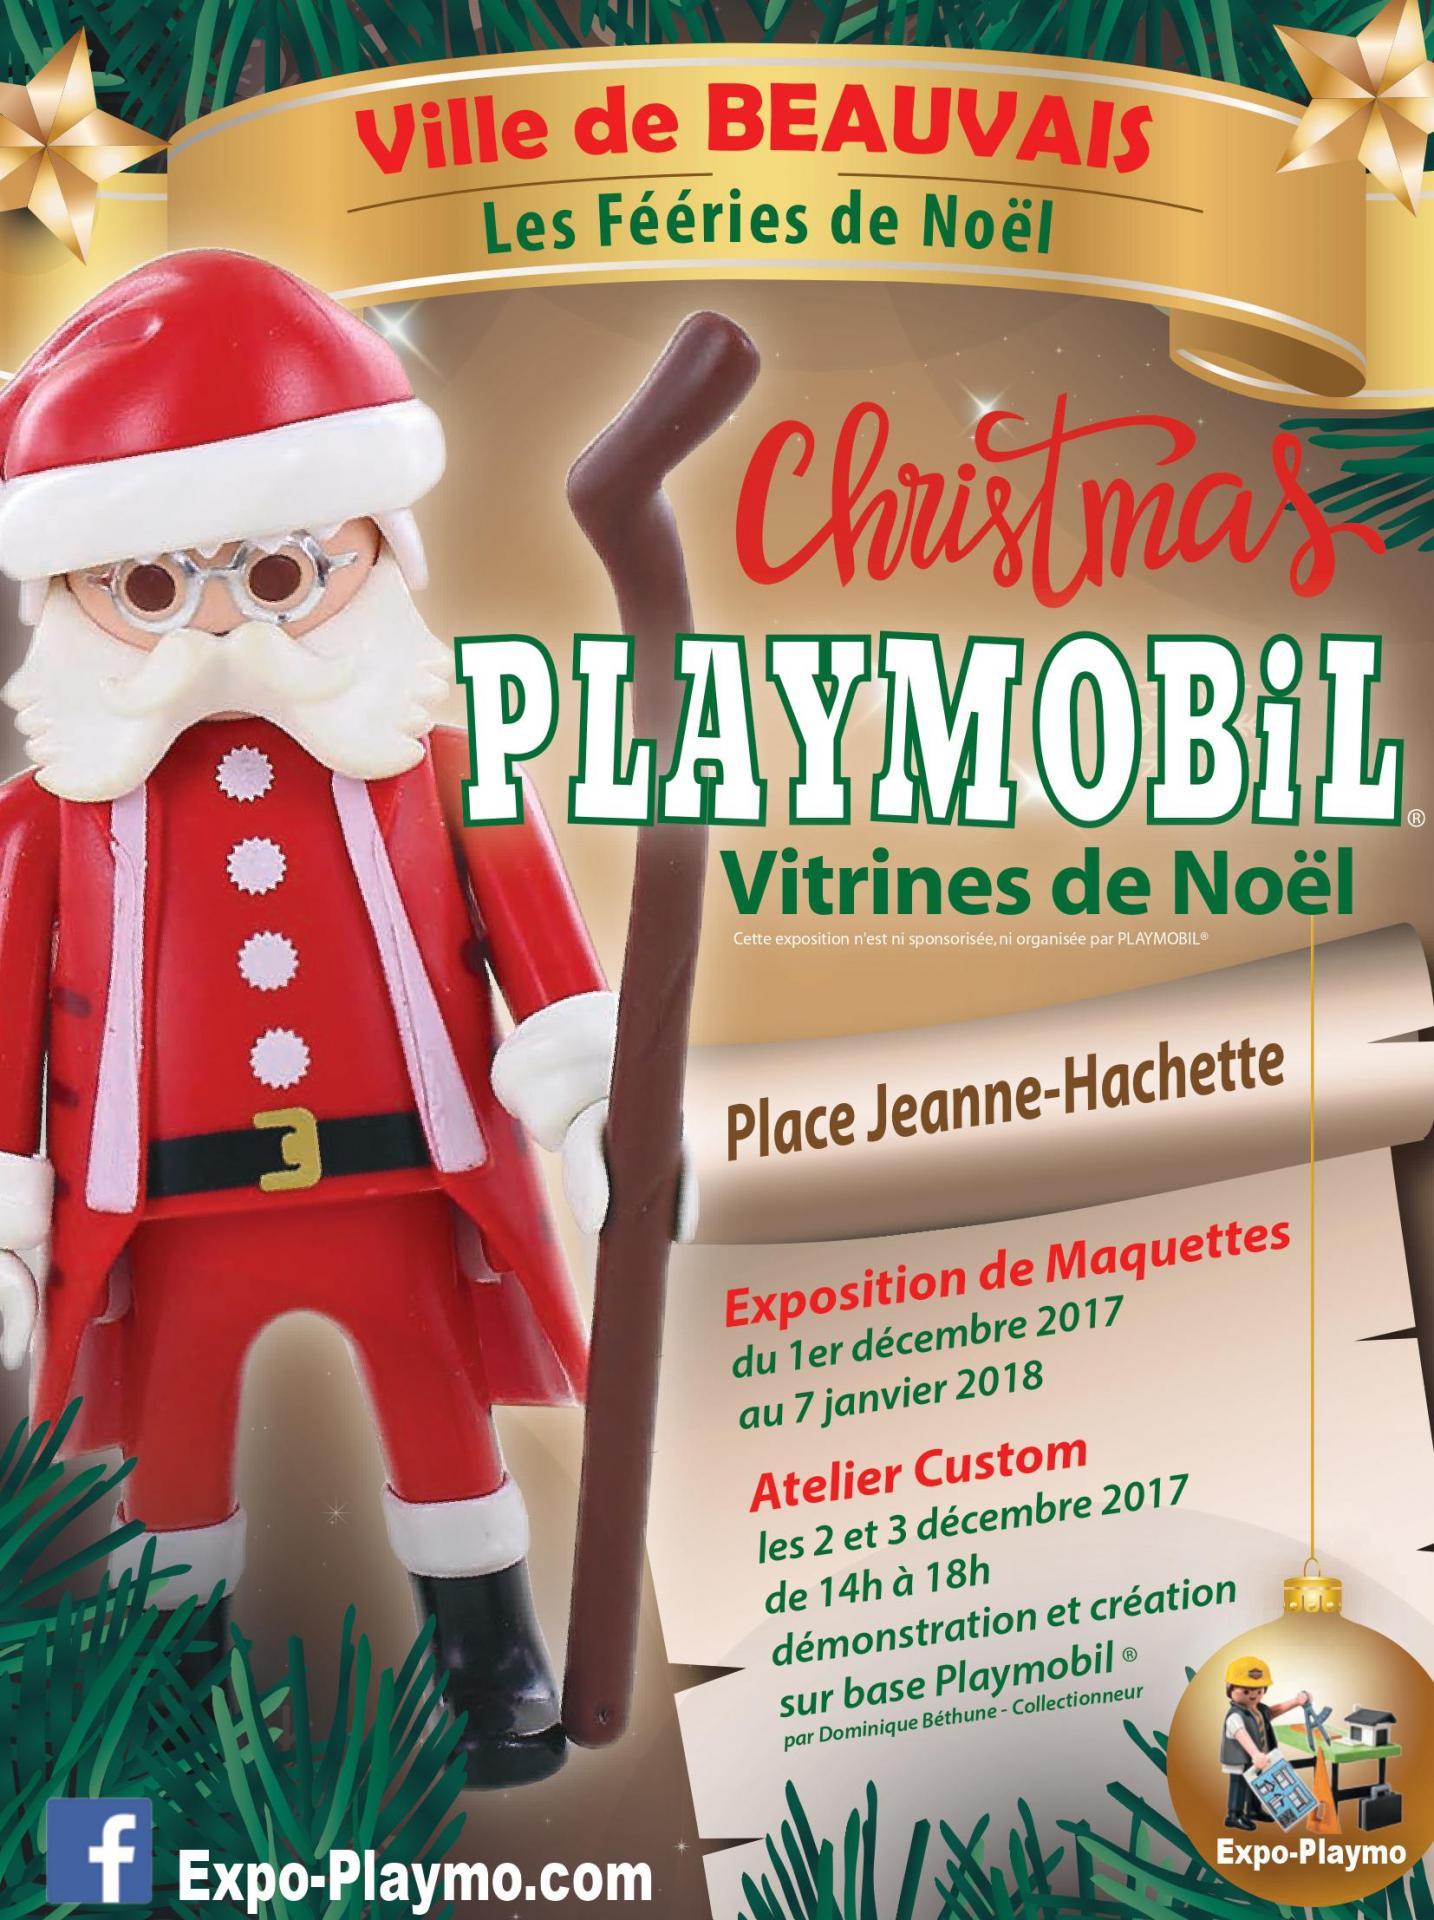 Exposition playmobil beauvais dominique bethune